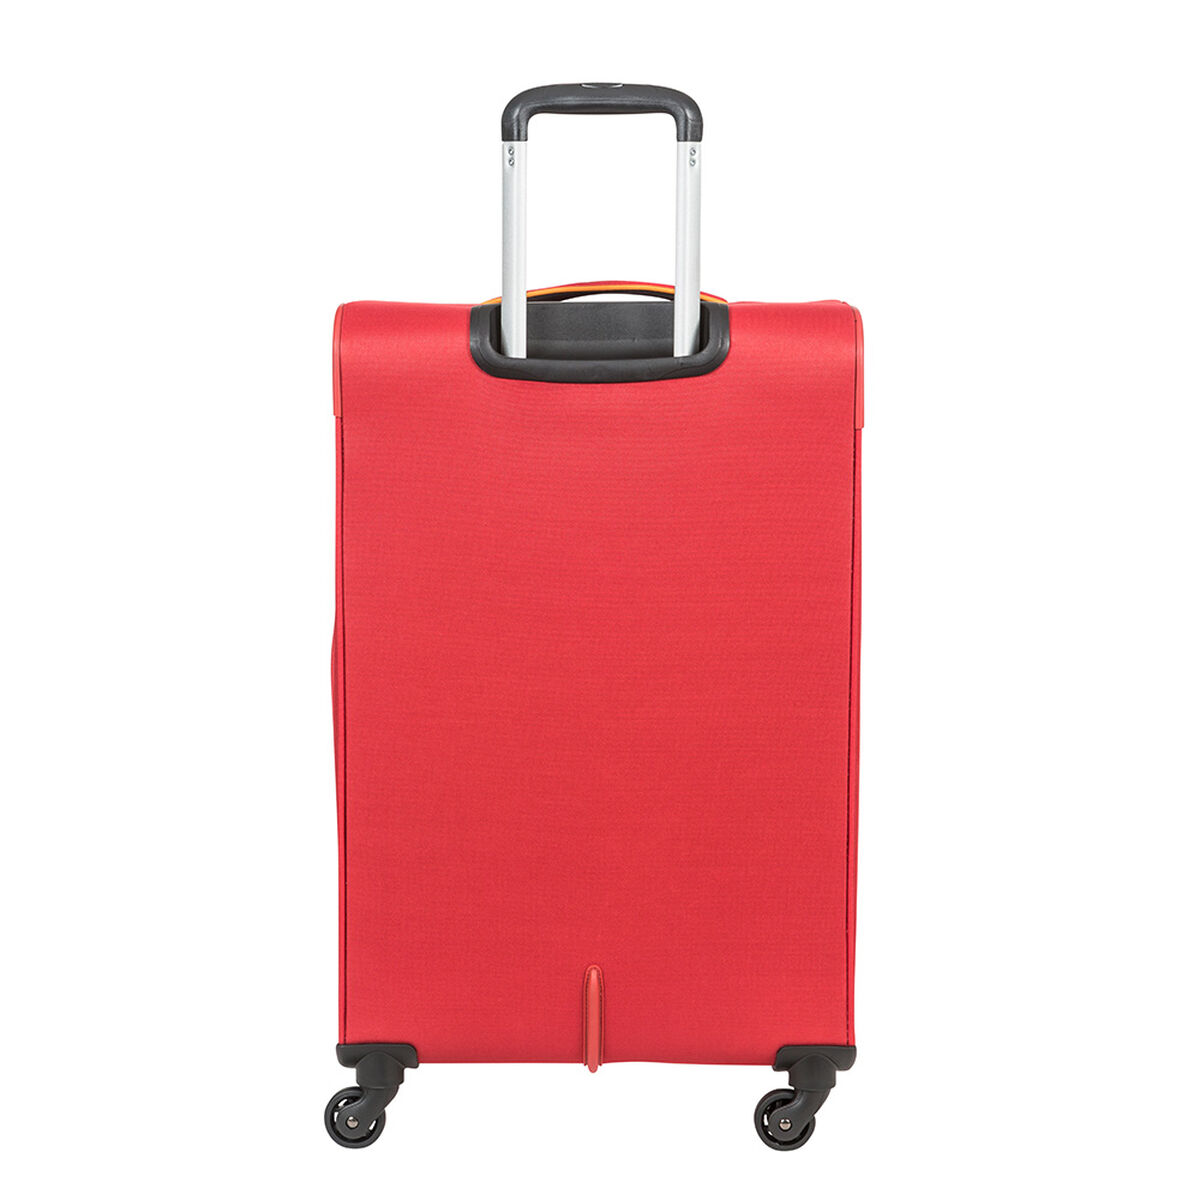 Maleta American Tourister Stirling Light Rojo M